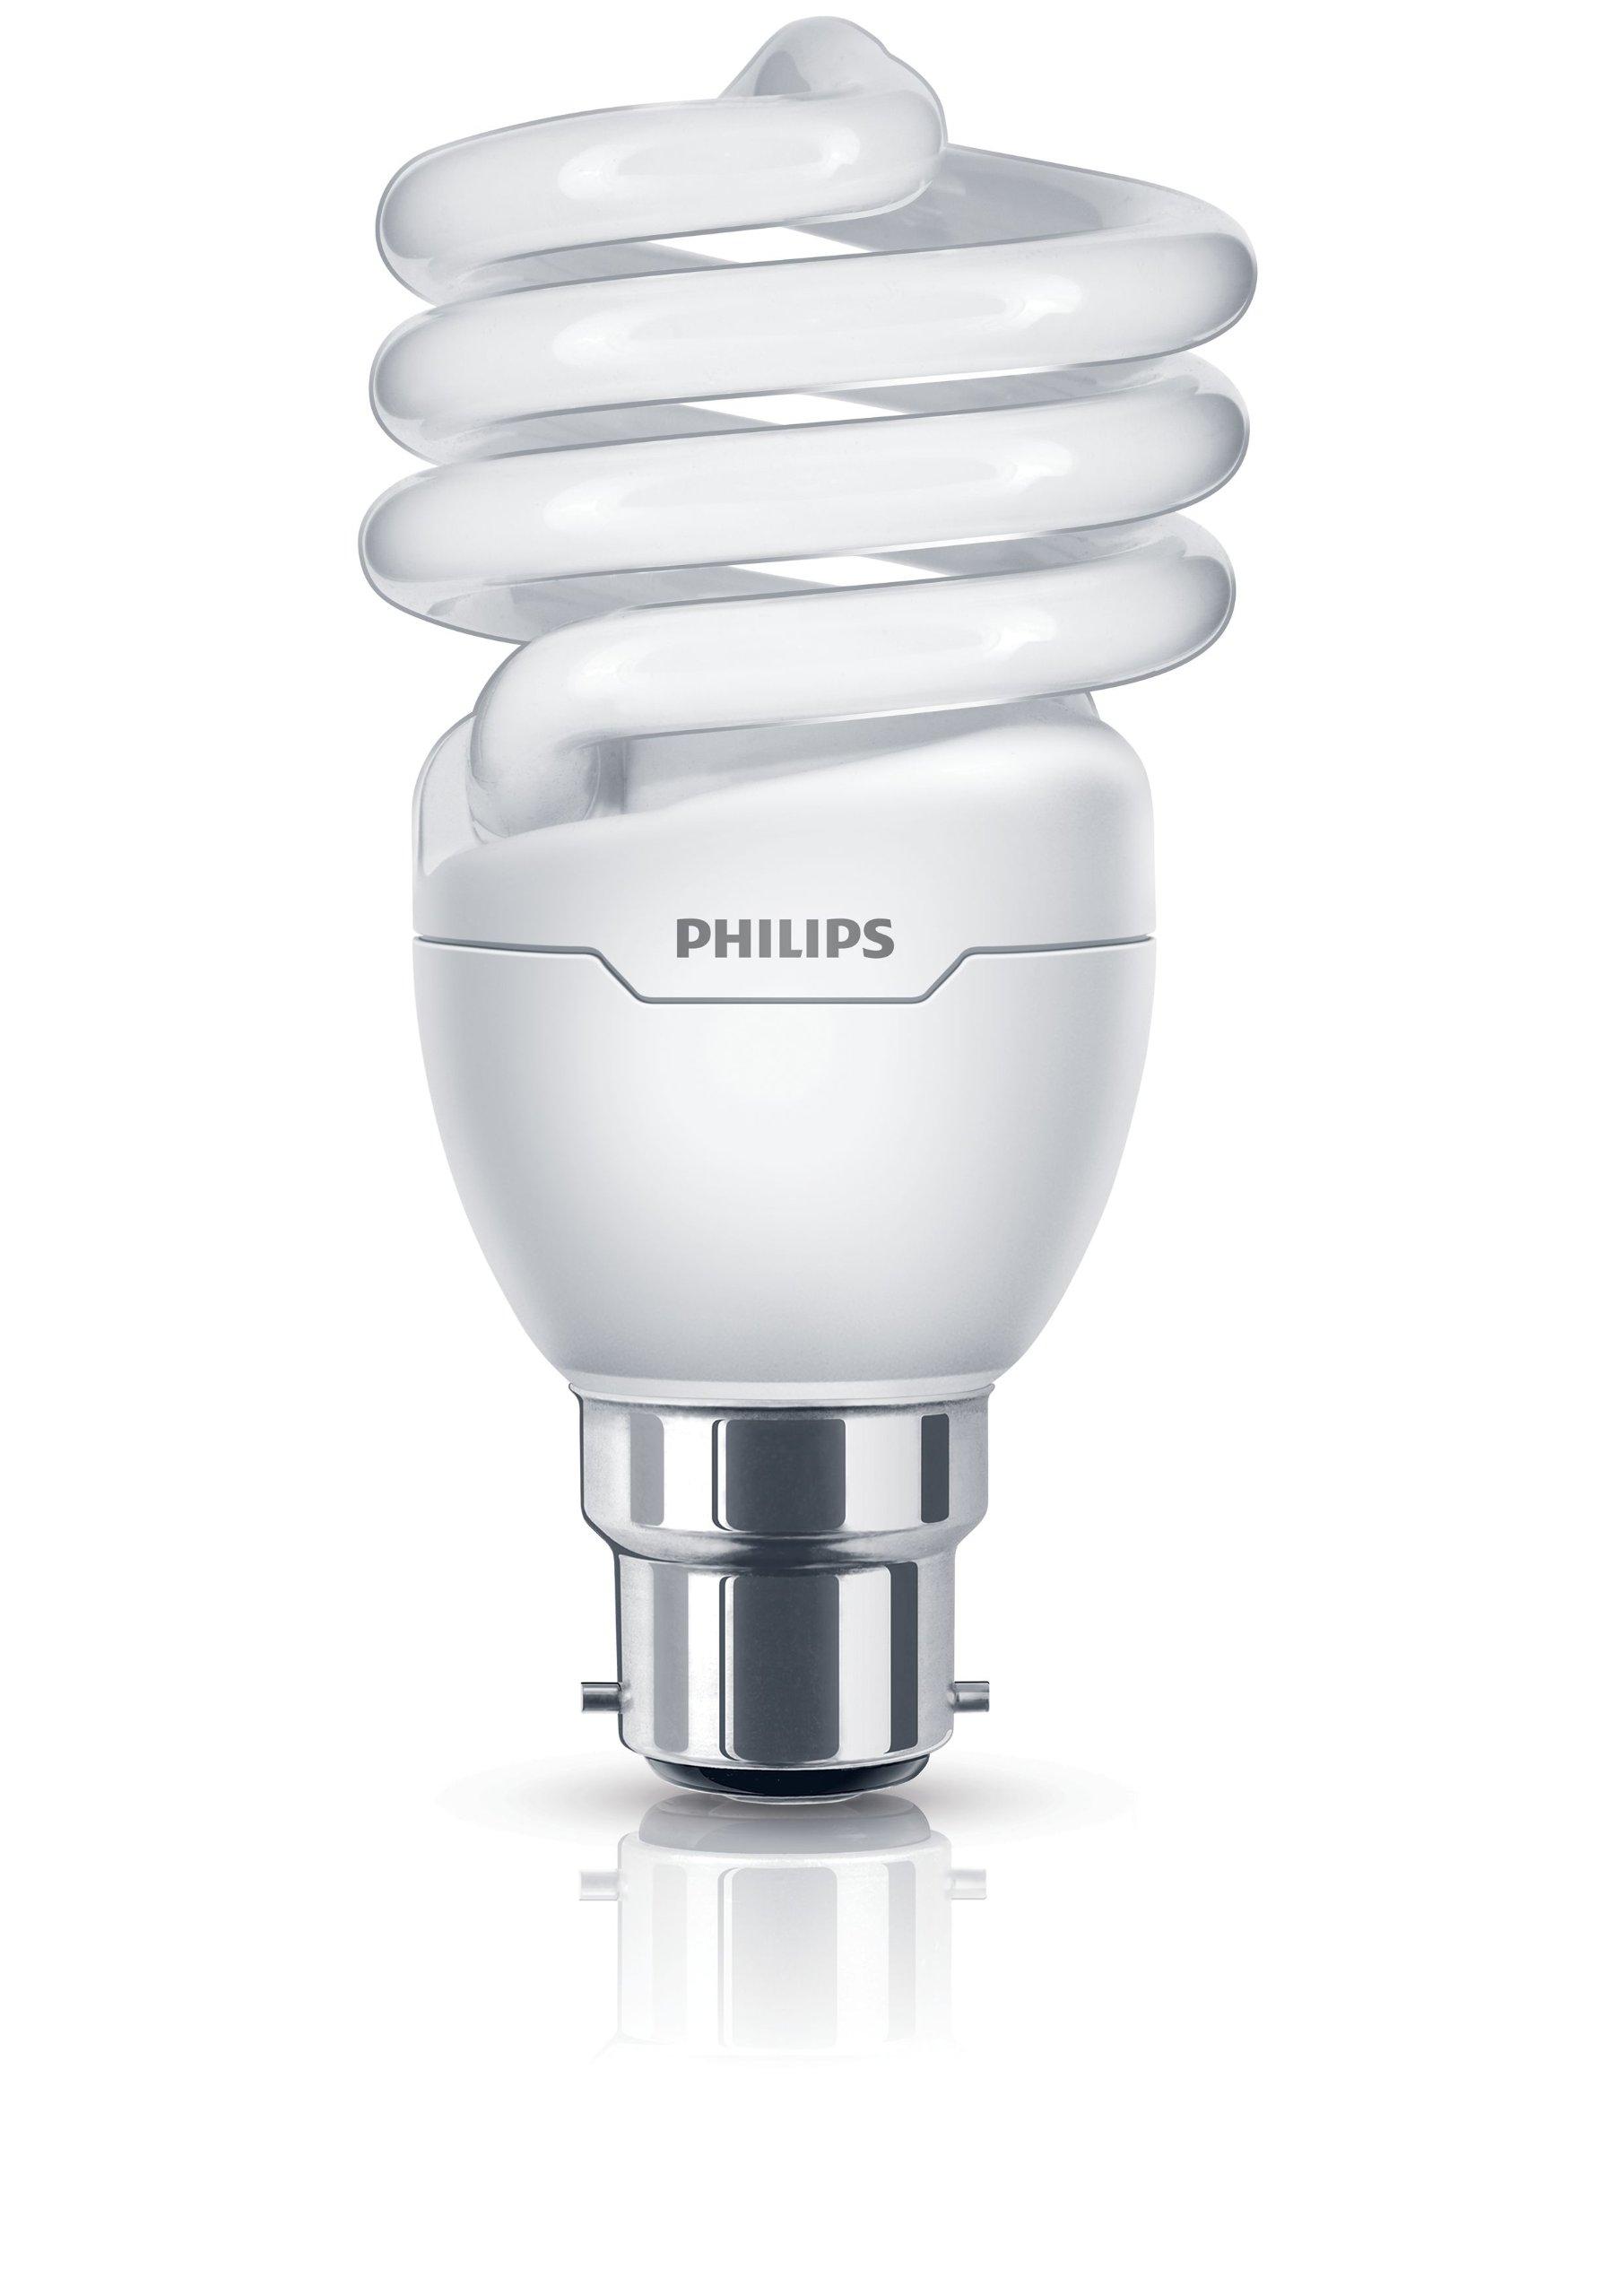 Philips Tornado Compact Fluorescent Spiral B22 Bayonet Cap Light Bulb, 20 W (95 W Equivalent, 10000 Hours) - Warm White